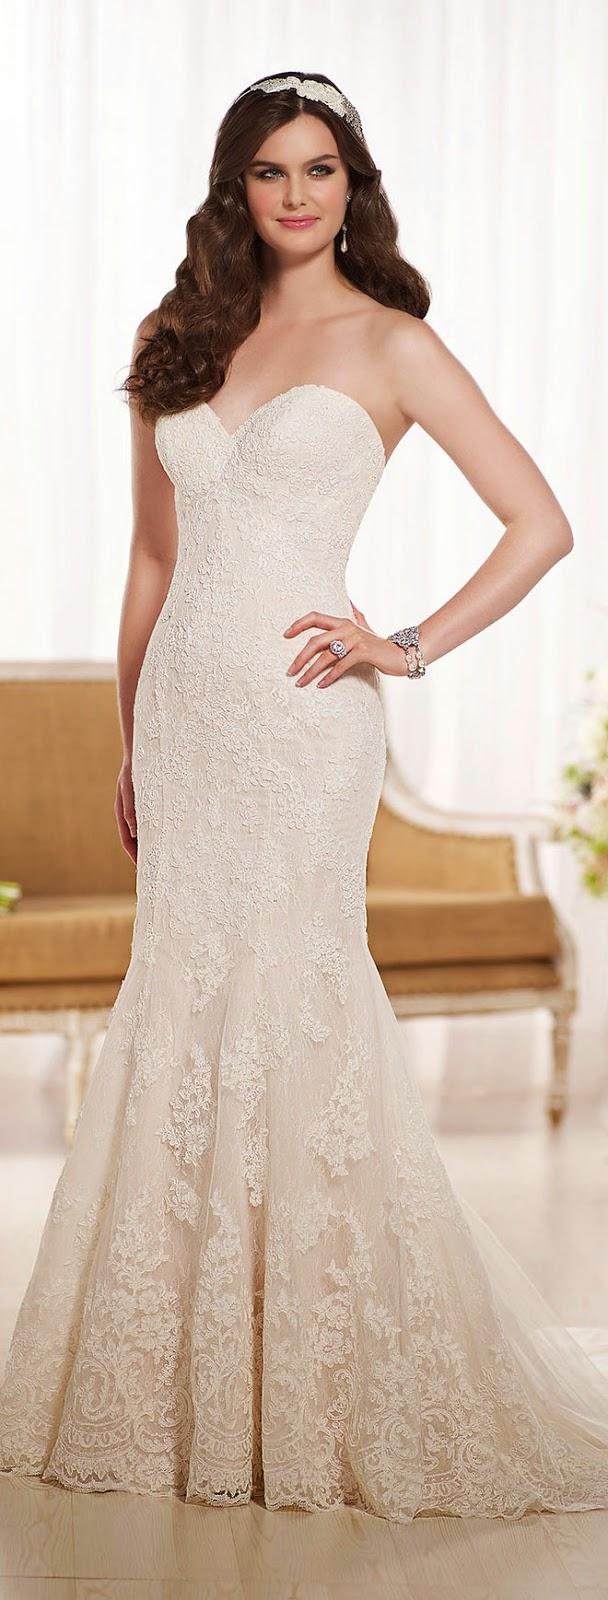 e3a1d0d93c6e Essense Of Australia Backless Lace Wedding Dress D1788